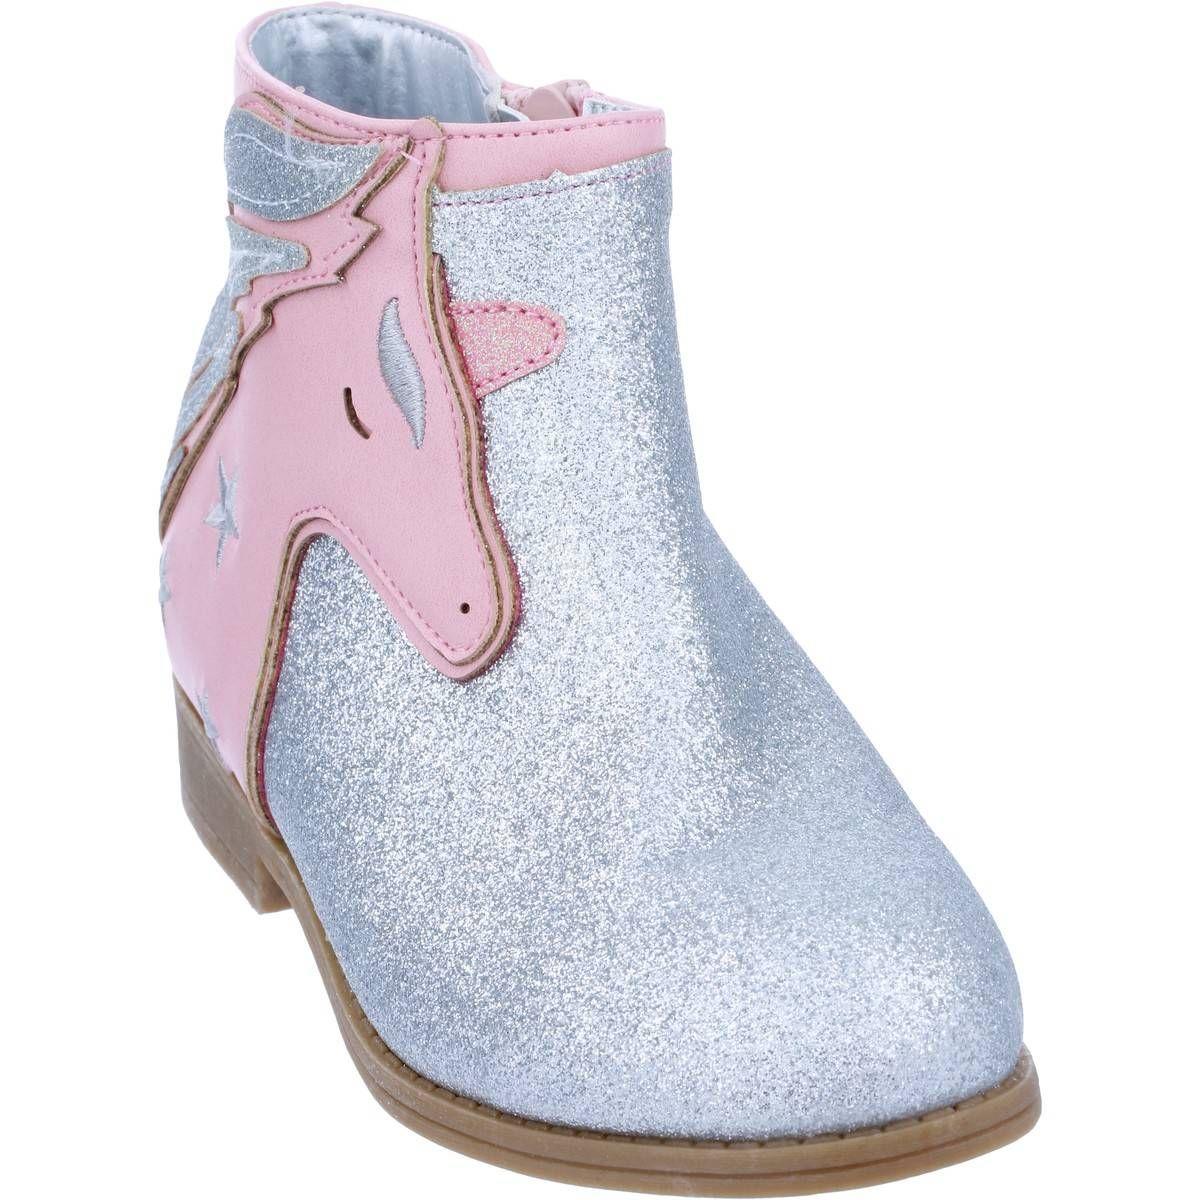 K-D Girls Unicorn Boots - Silver | BIG